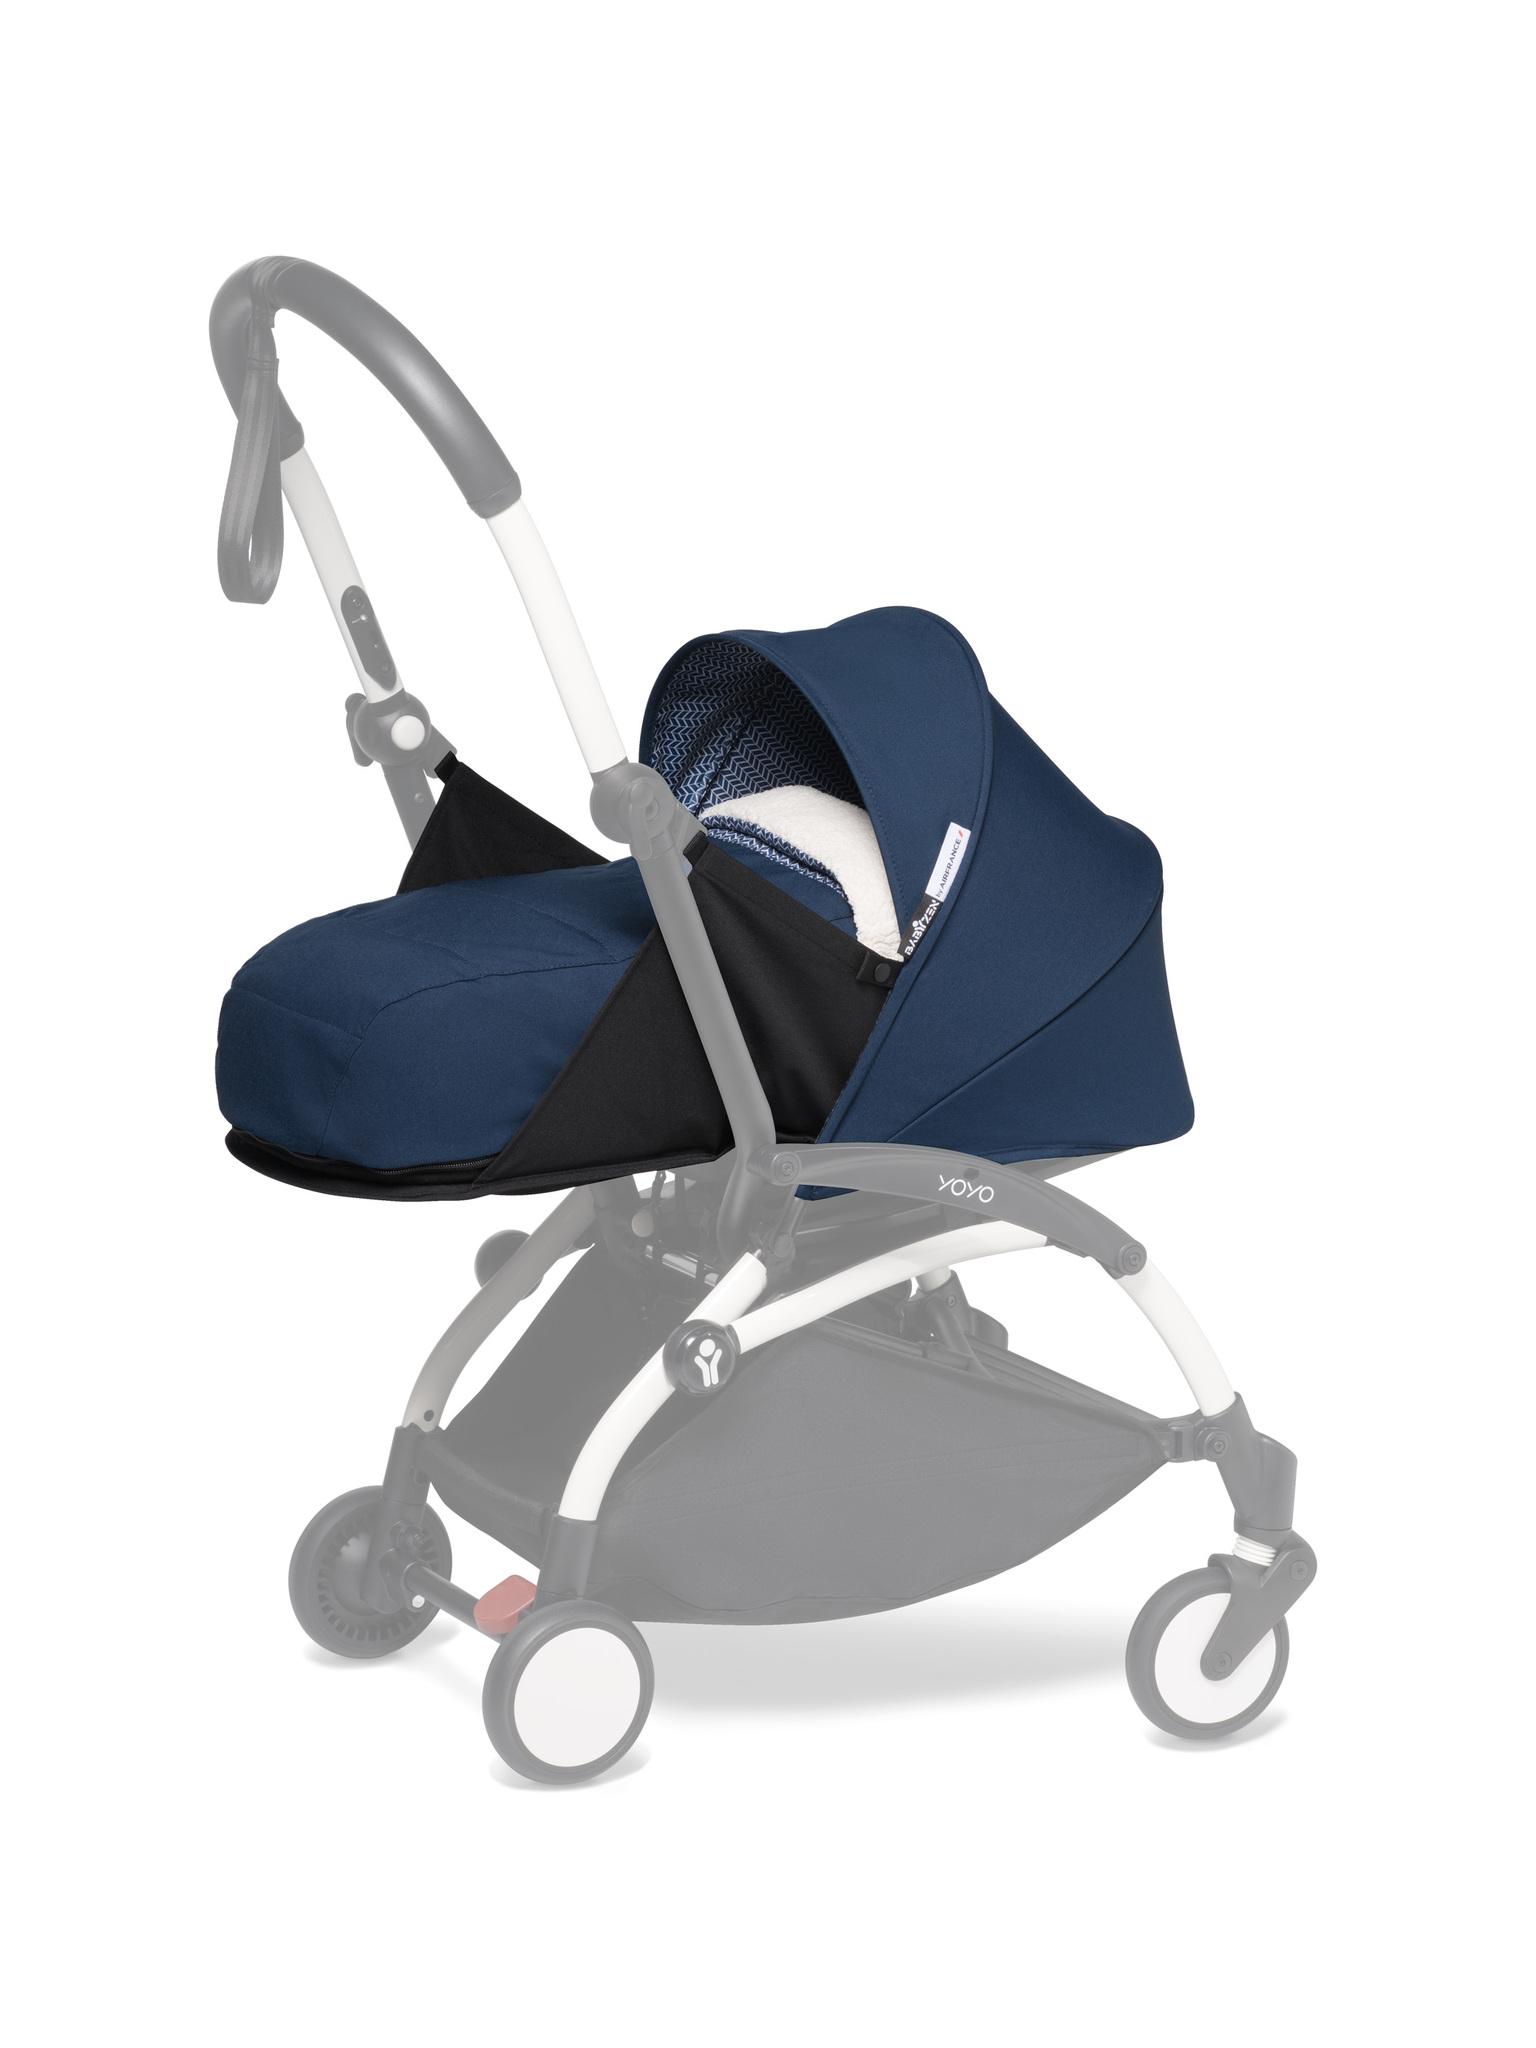 Комплект люльки для новорождённого BabyZen YOYO2 0+ Navy Blue Синий